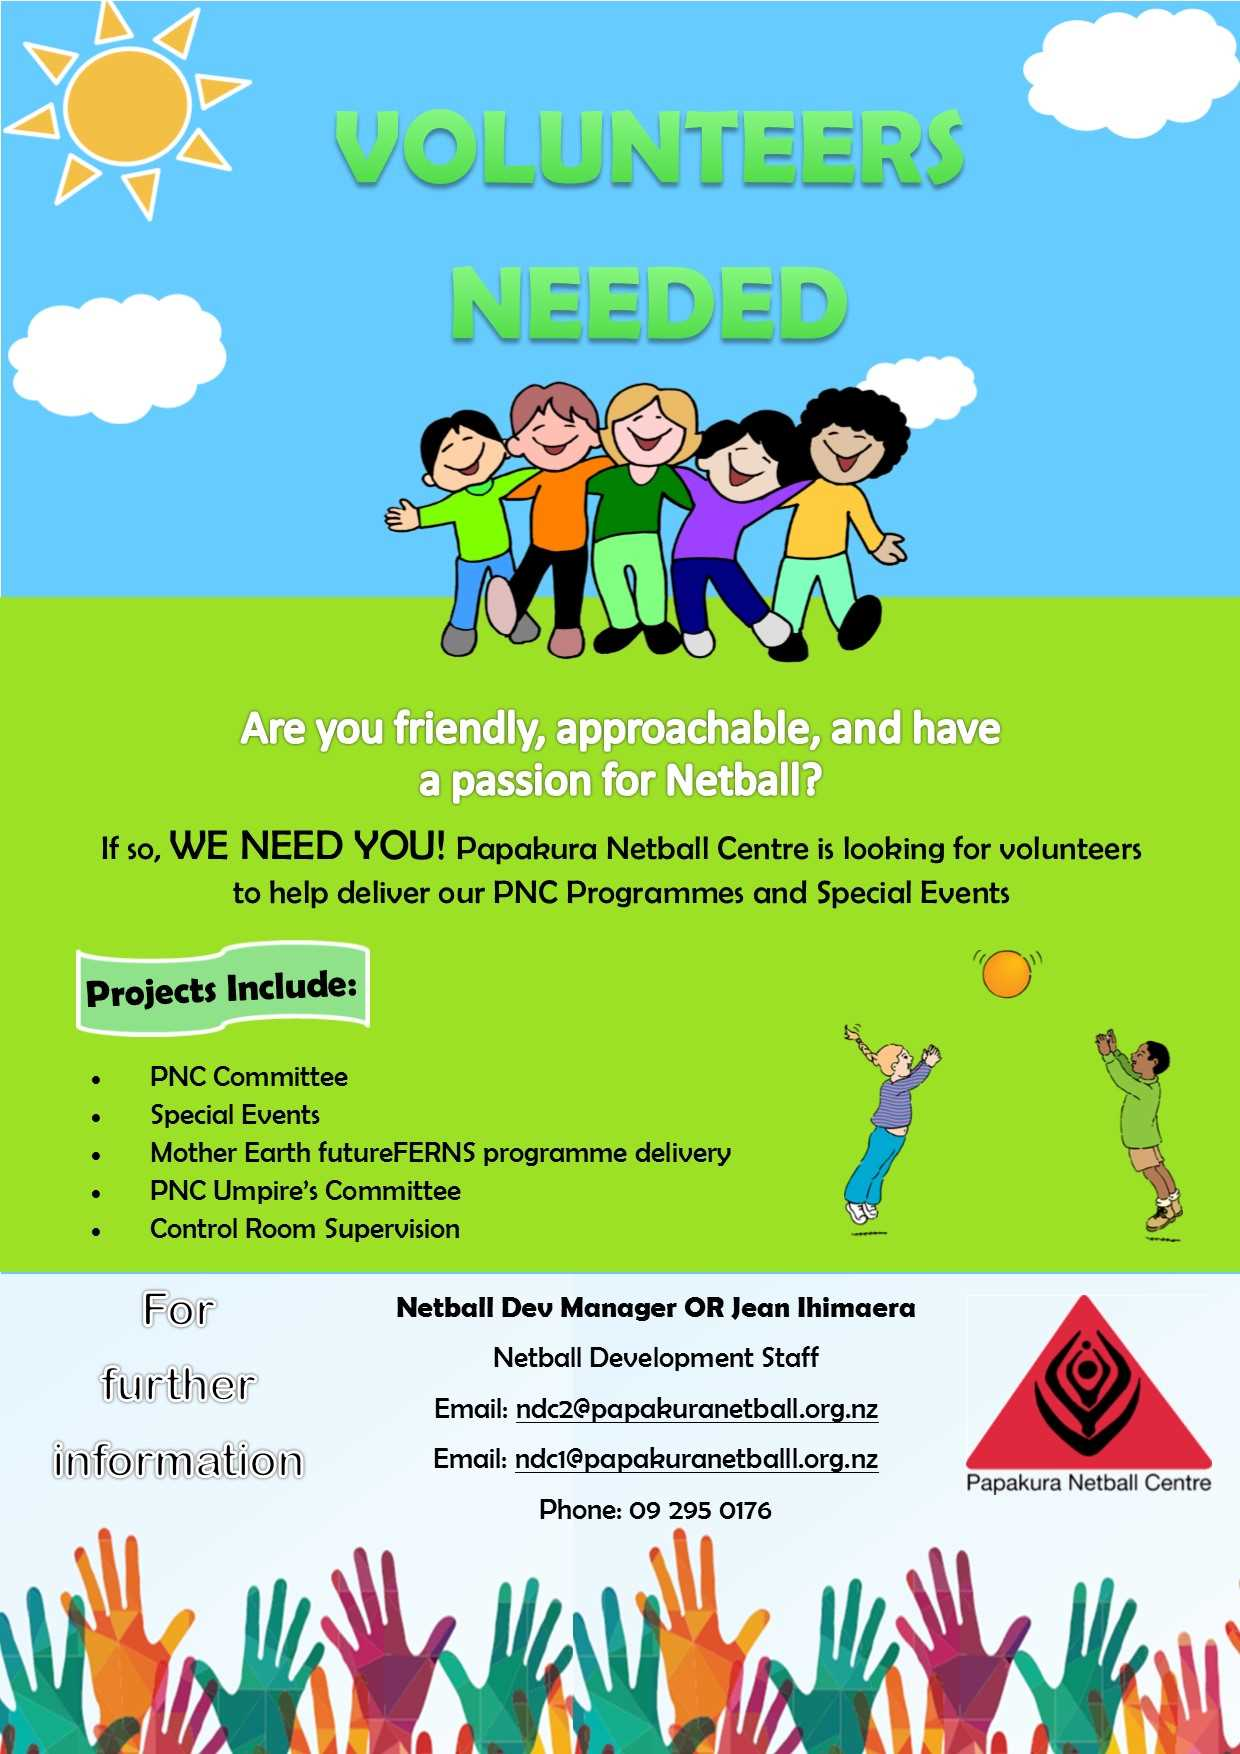 Papakura Netball Centre - Volunteers